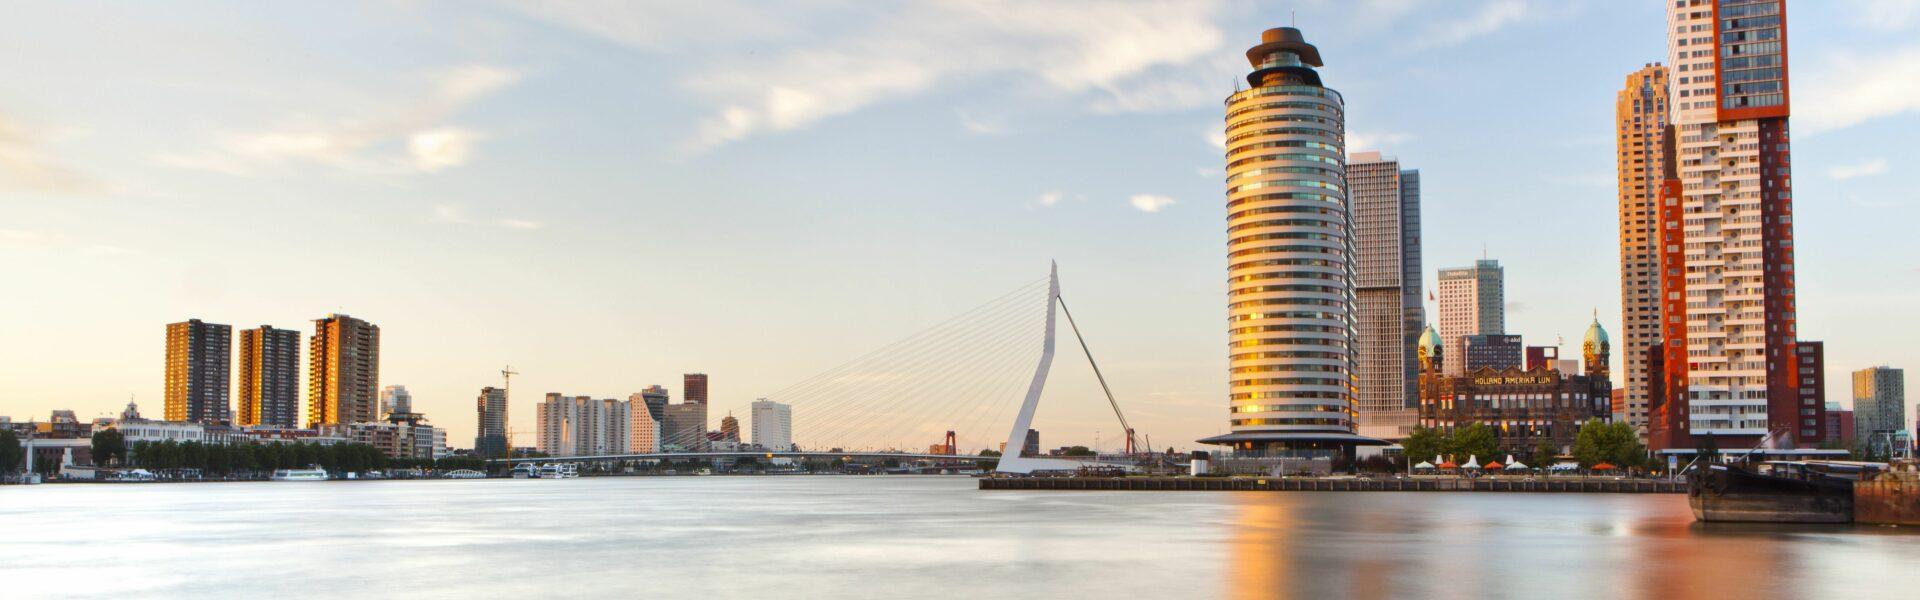 FEI European Championships 2019 Rotterdam Meet Rotterdam